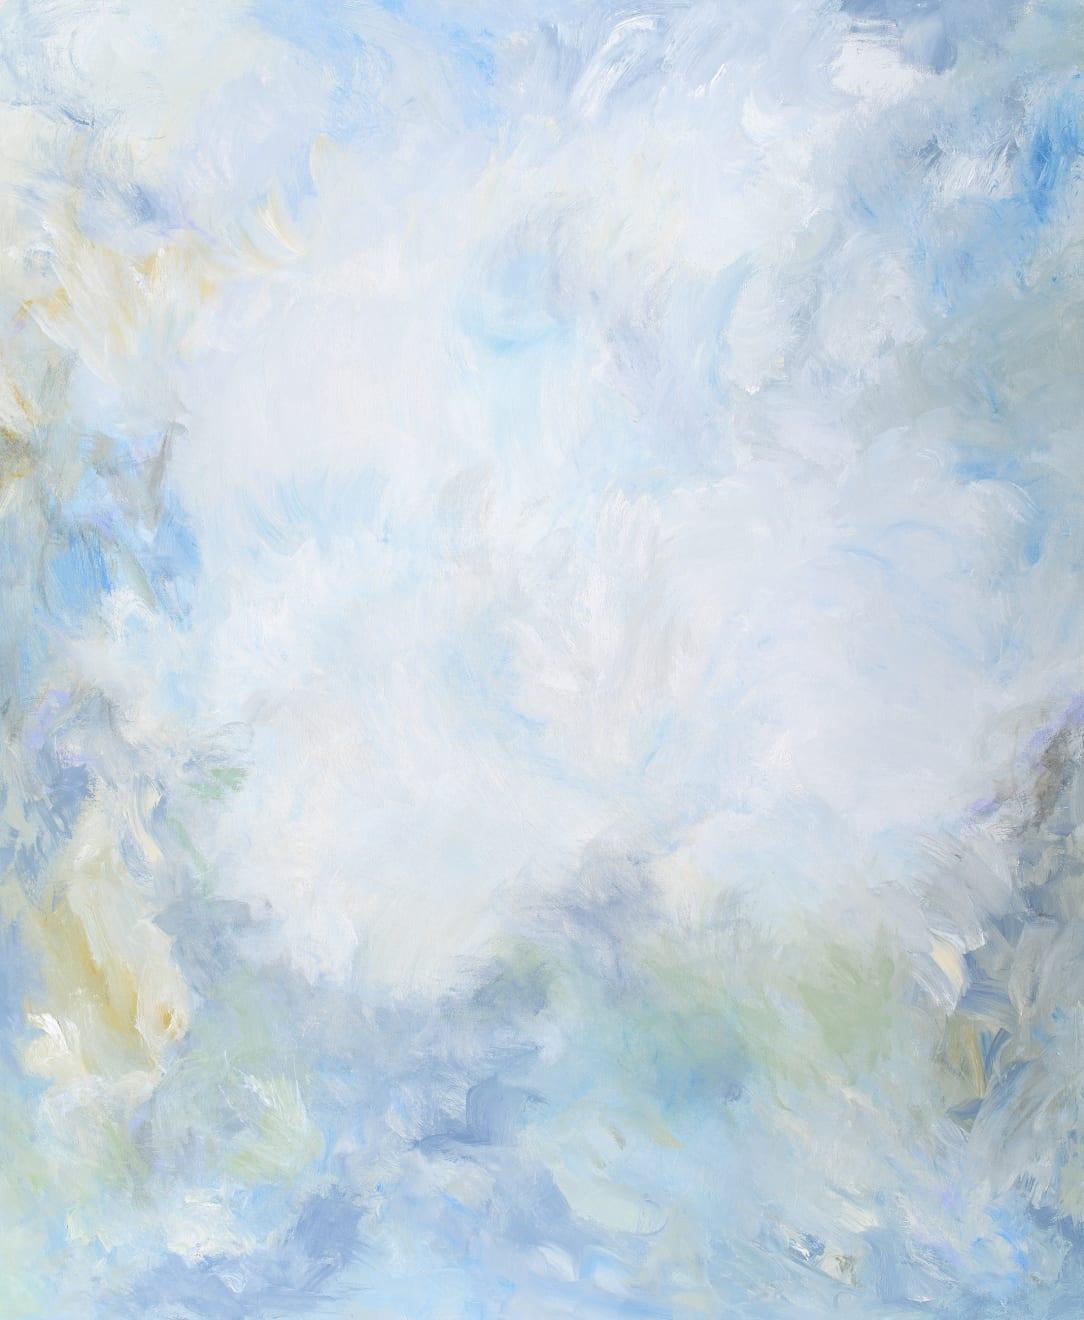 Patricia Qualls, Breathing in Nature, 2021